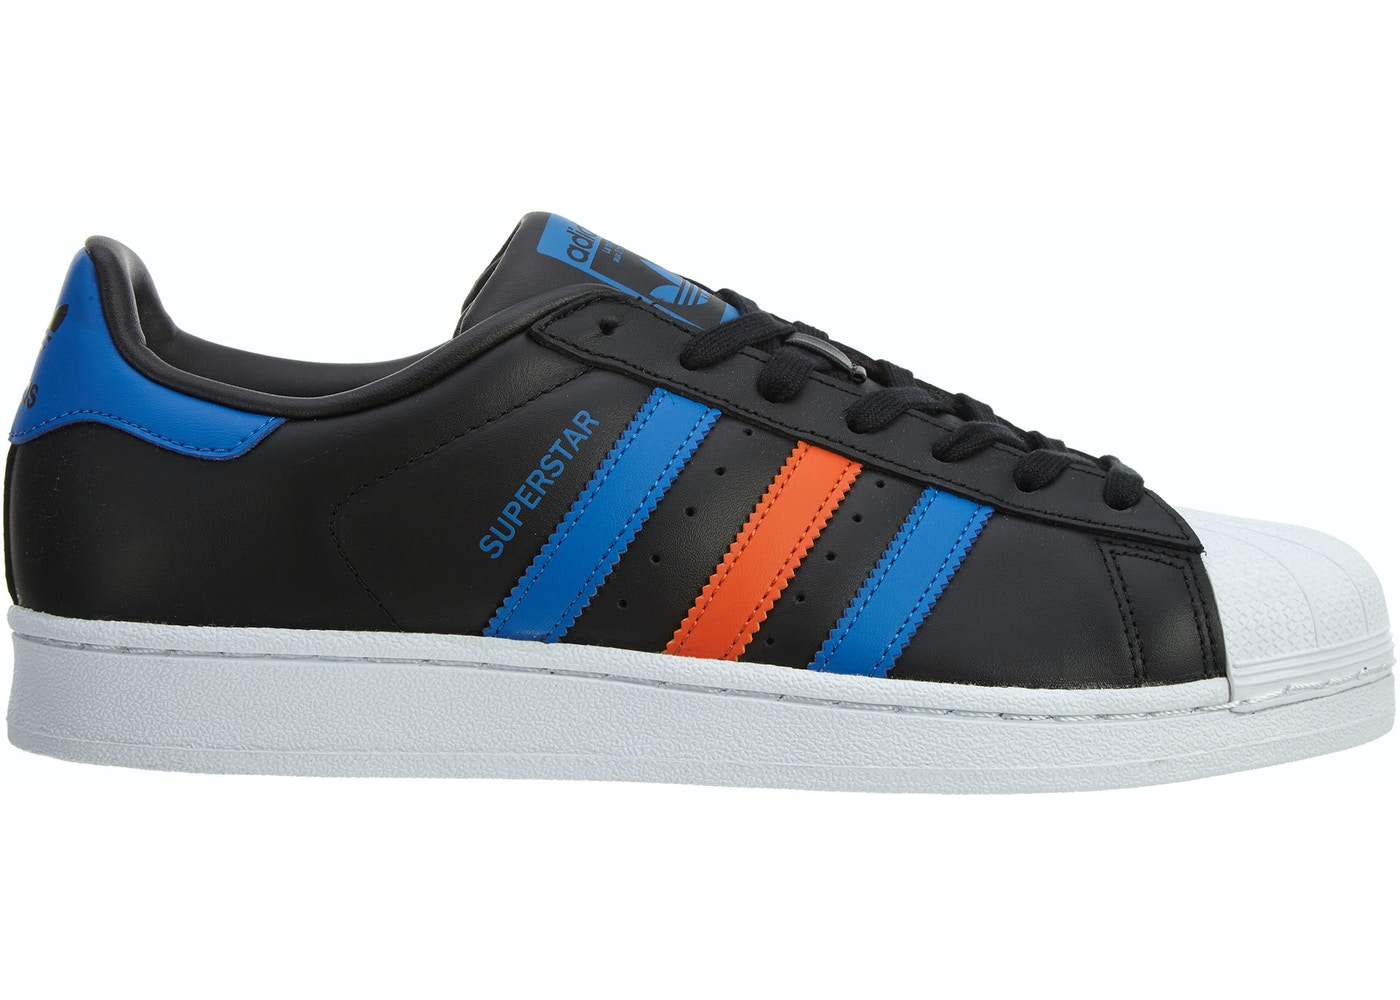 7a65aa18f5c2 adidas Superstar Black Blue-White - BB2245